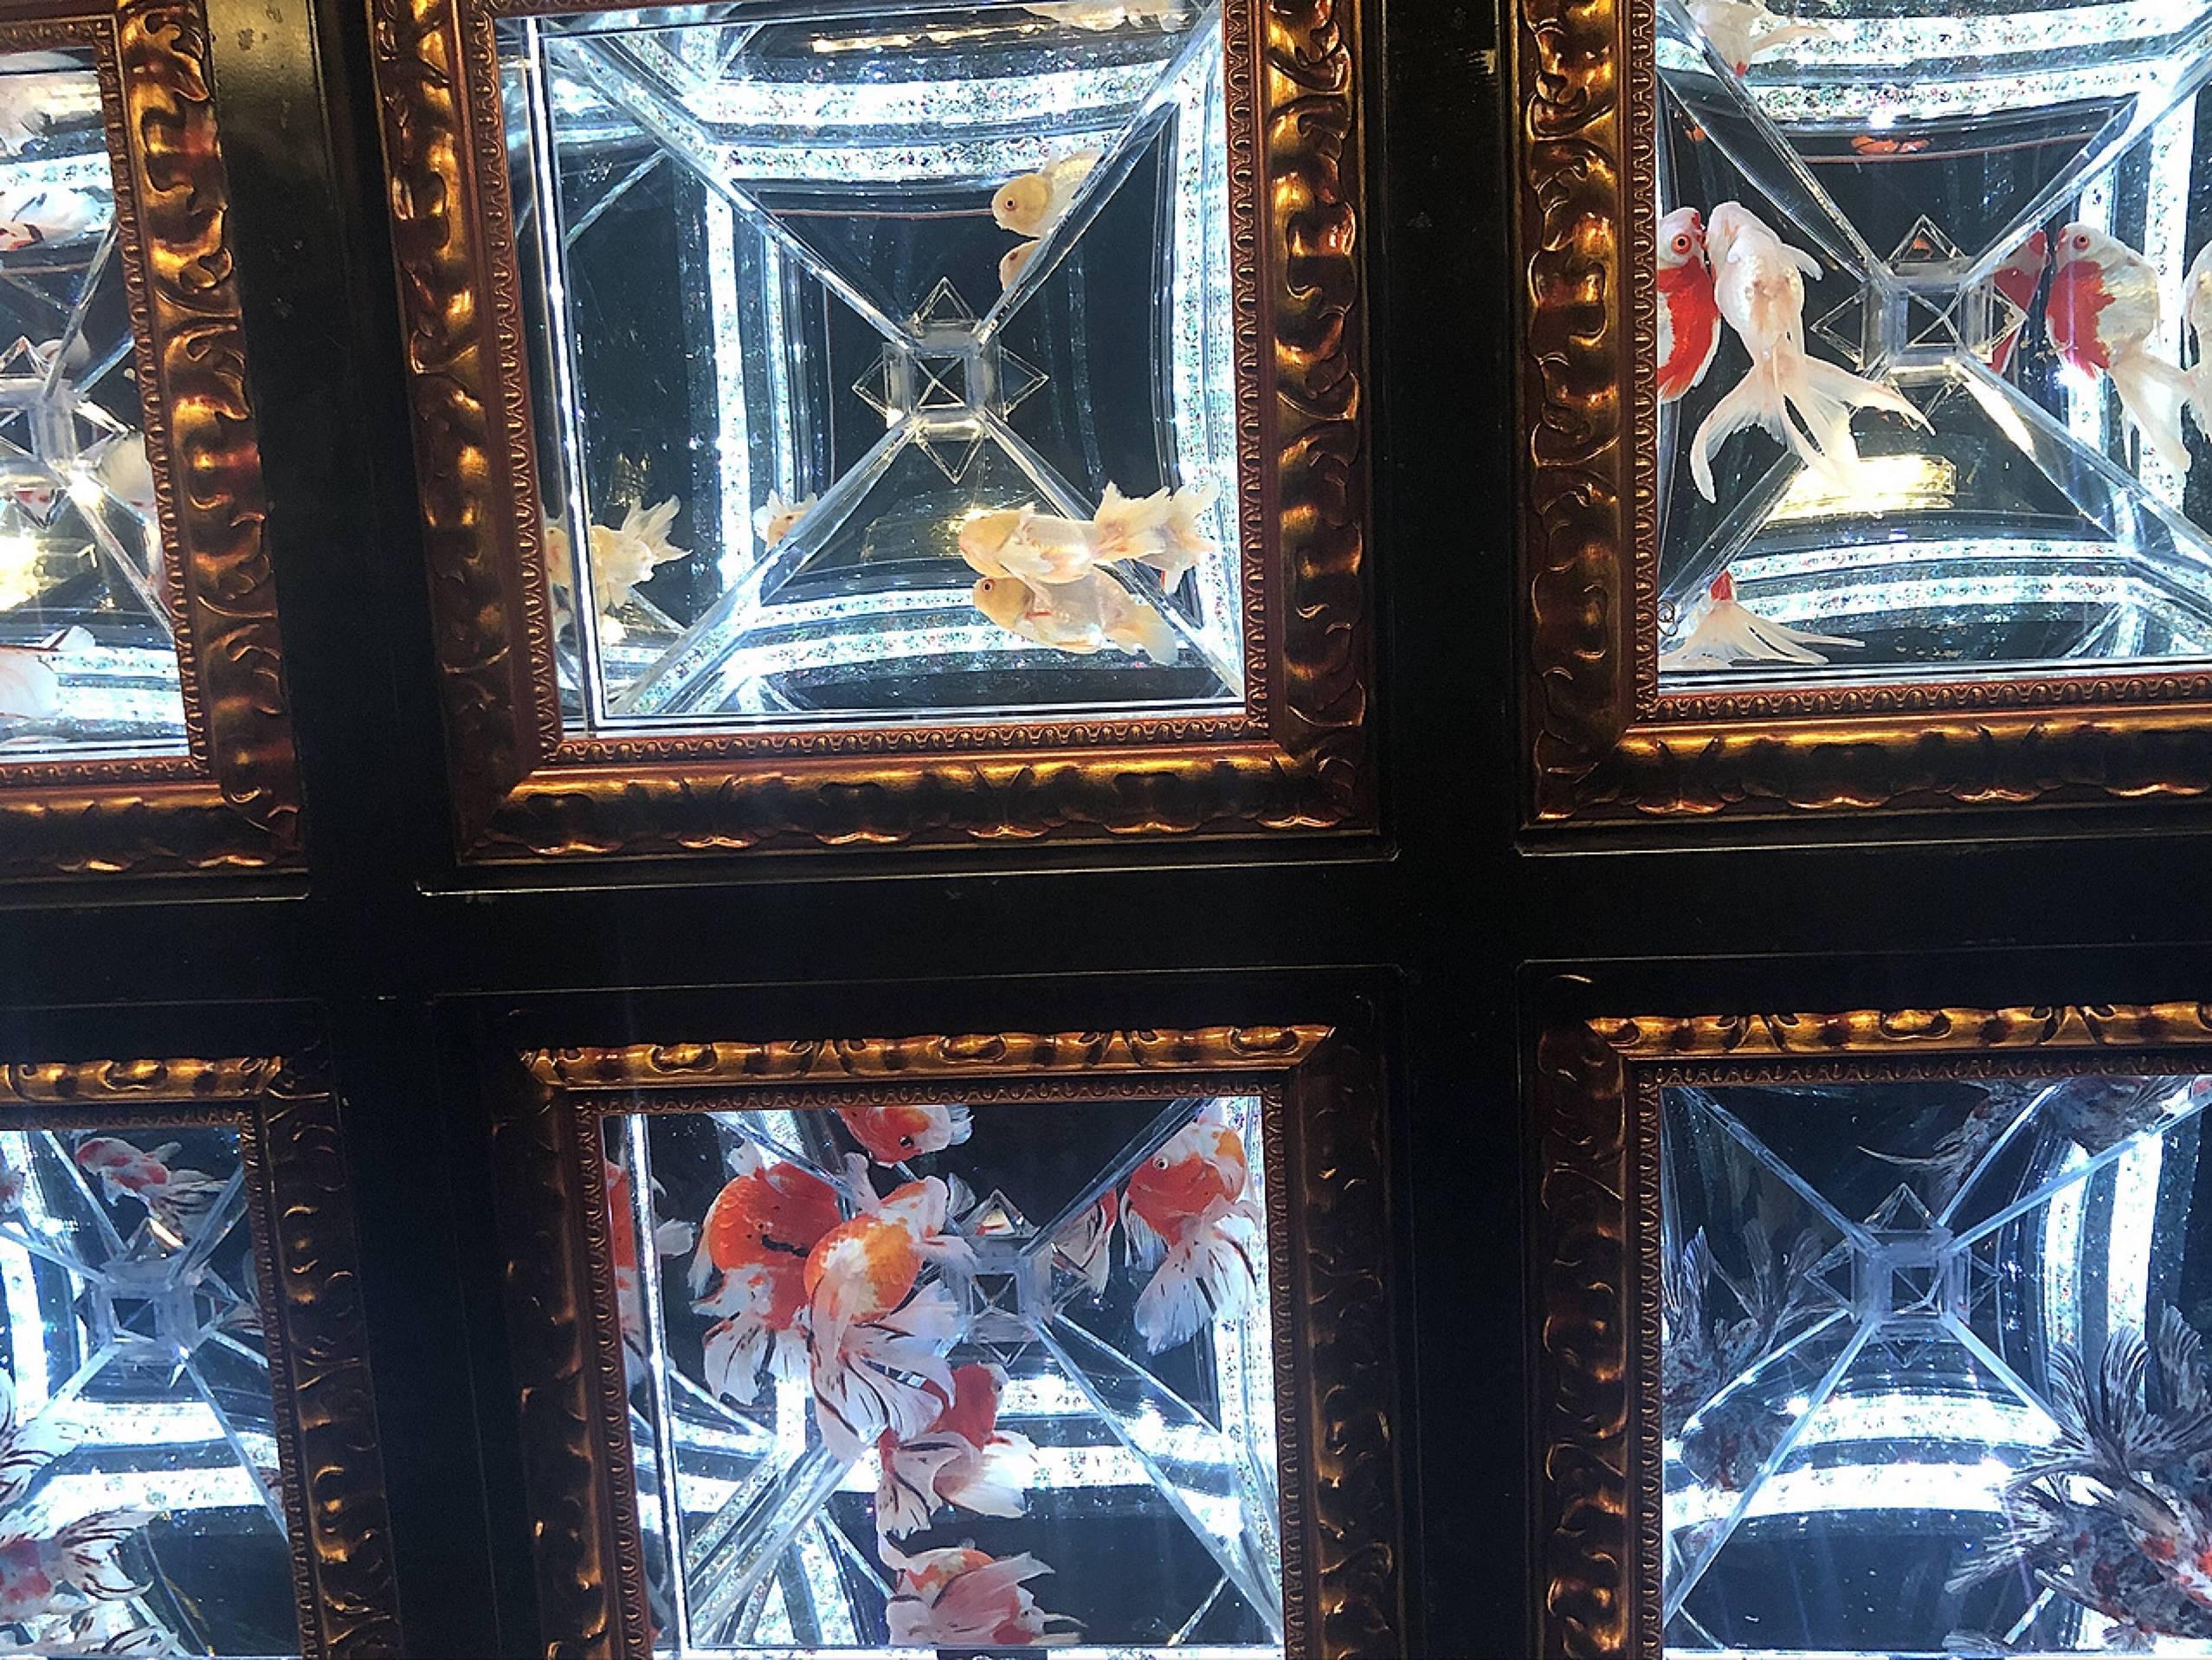 Vol.59♡ 9/24まで!8000匹の金魚がとてもフォトジェニック!【日本橋アートアクアリウム2018】_1_1